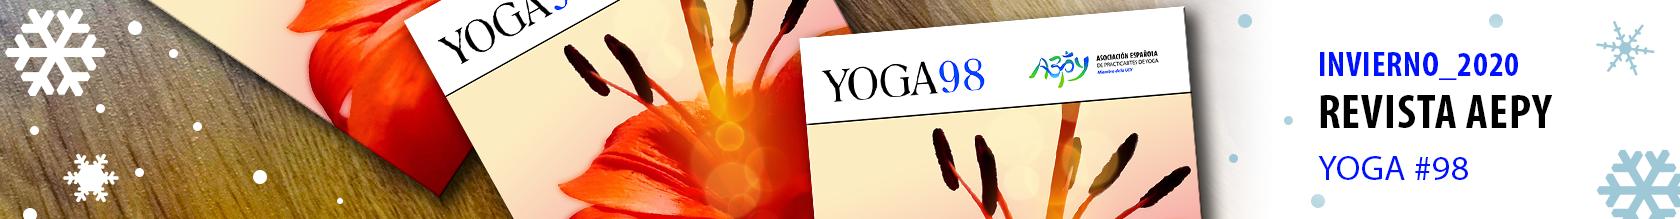 Slider-Invierno-2020-Revista-yoga-AEPY